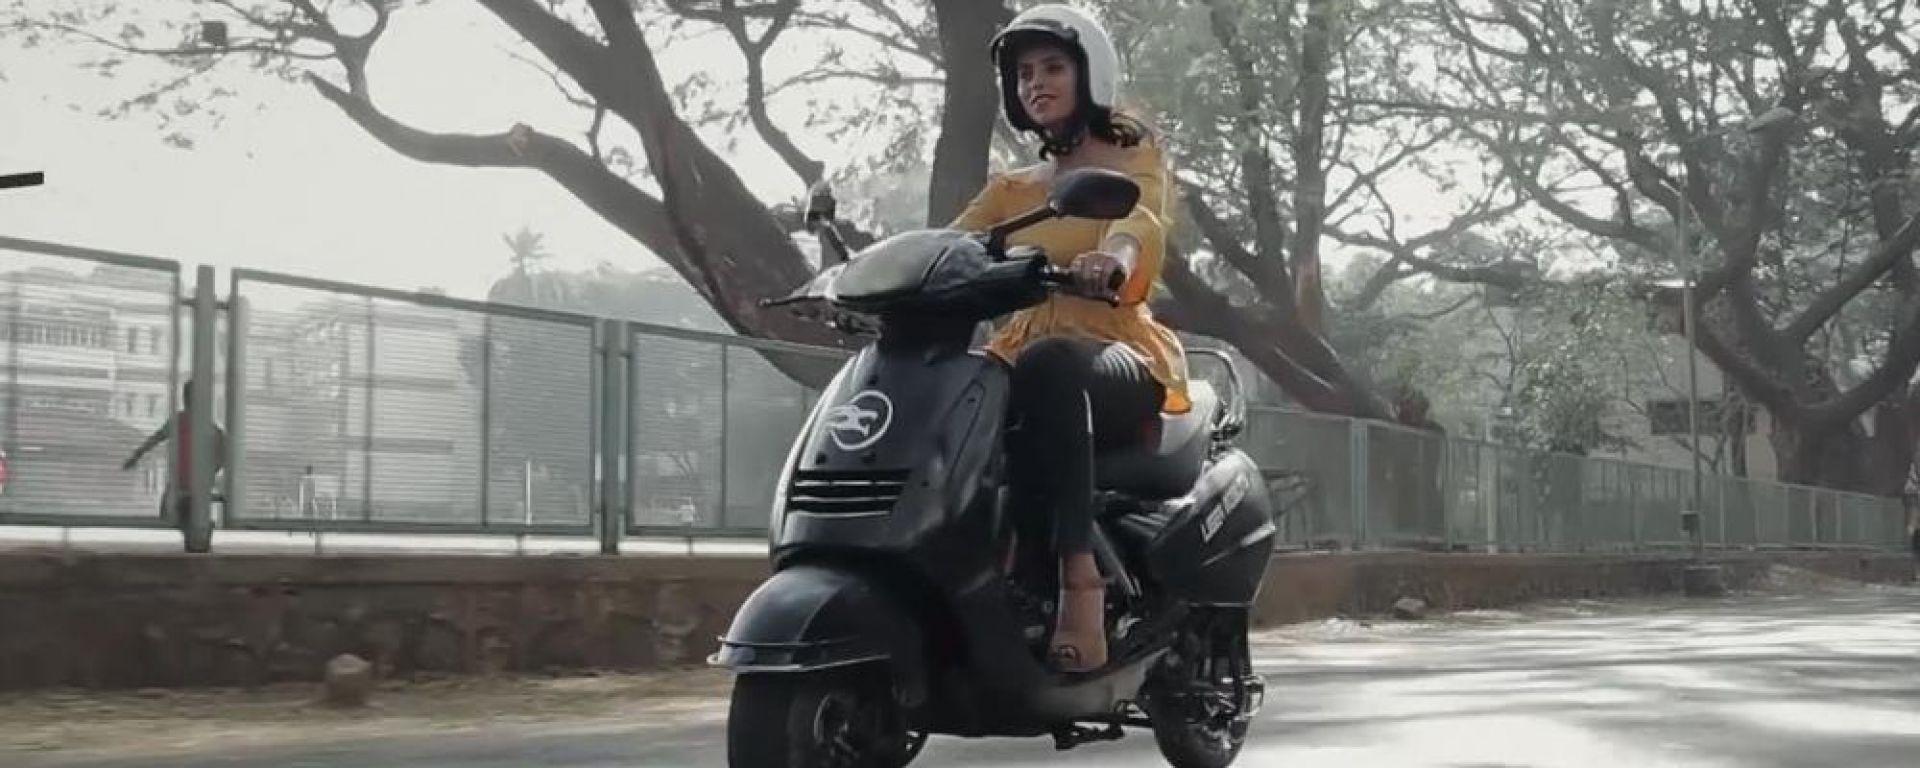 Startup indiana Liger Mobility: la startup indiana che non fa cadere lo scooter